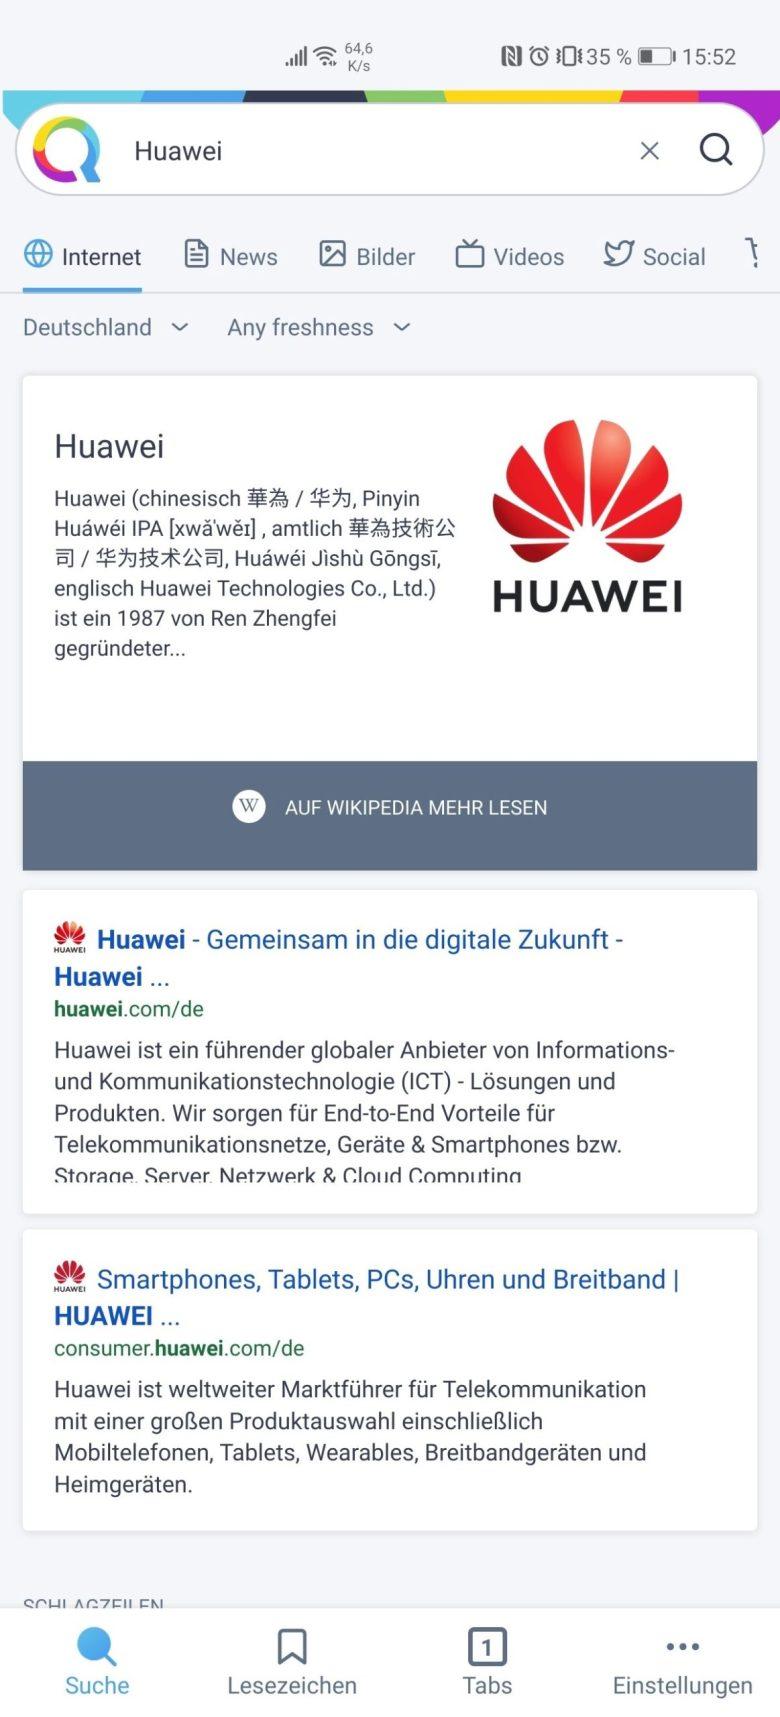 Huawei Qwant Suche